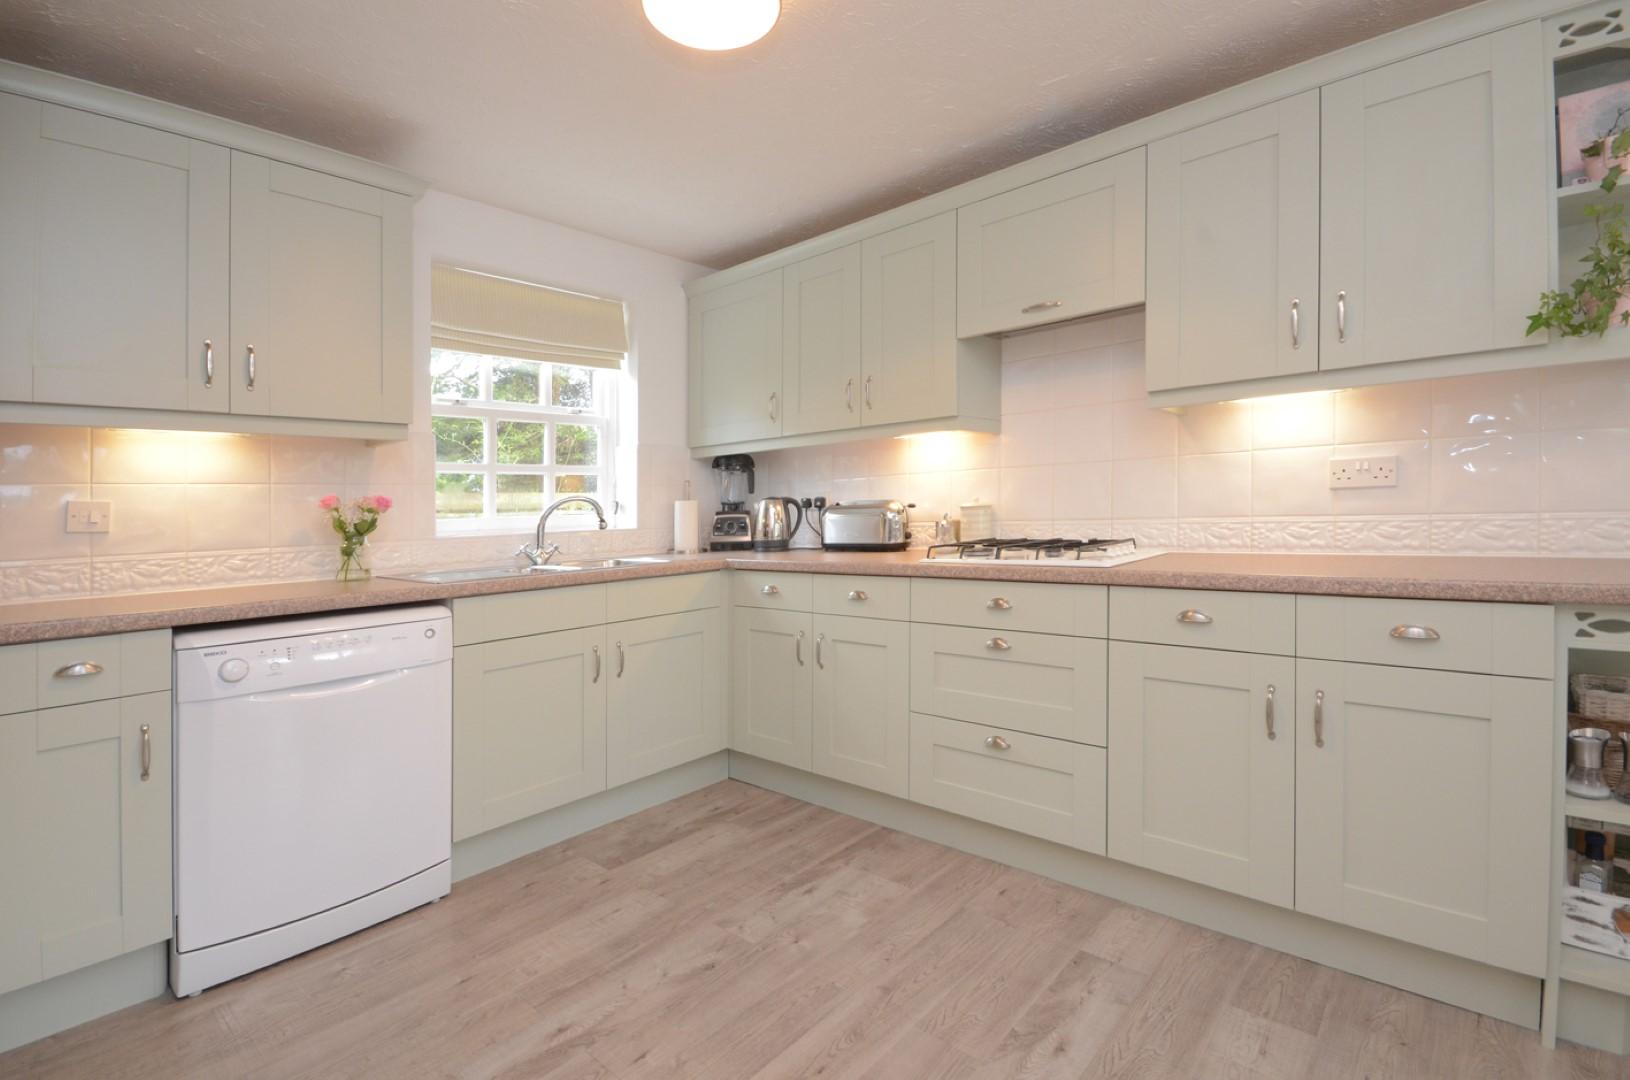 interior-photography-yorkshire-kitchen